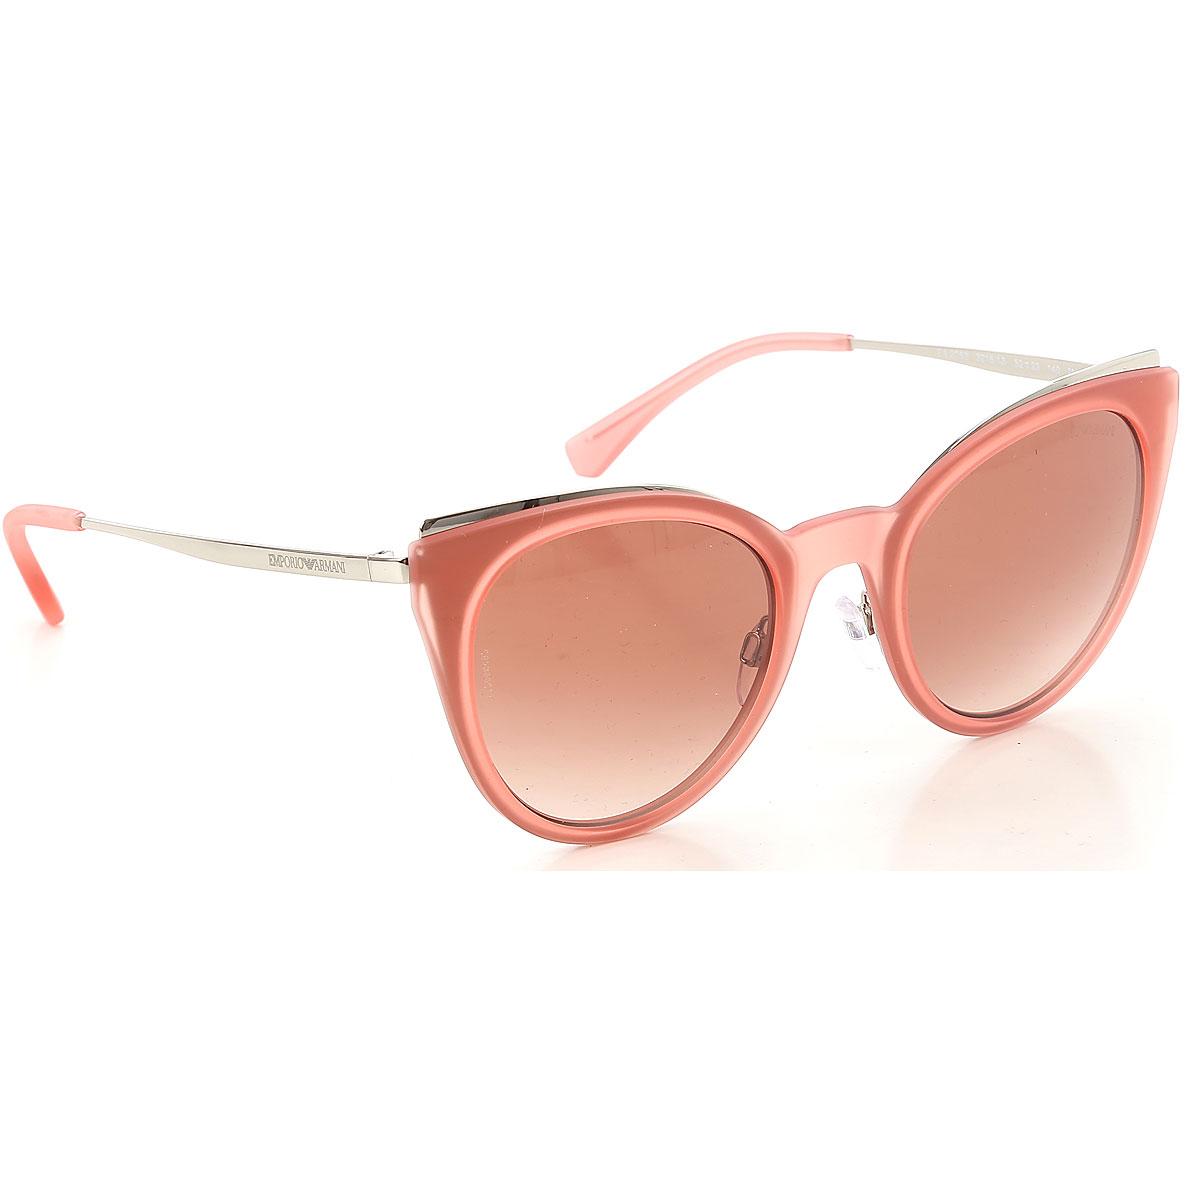 Image of Emporio Armani Sunglasses On Sale, Pink, 2017